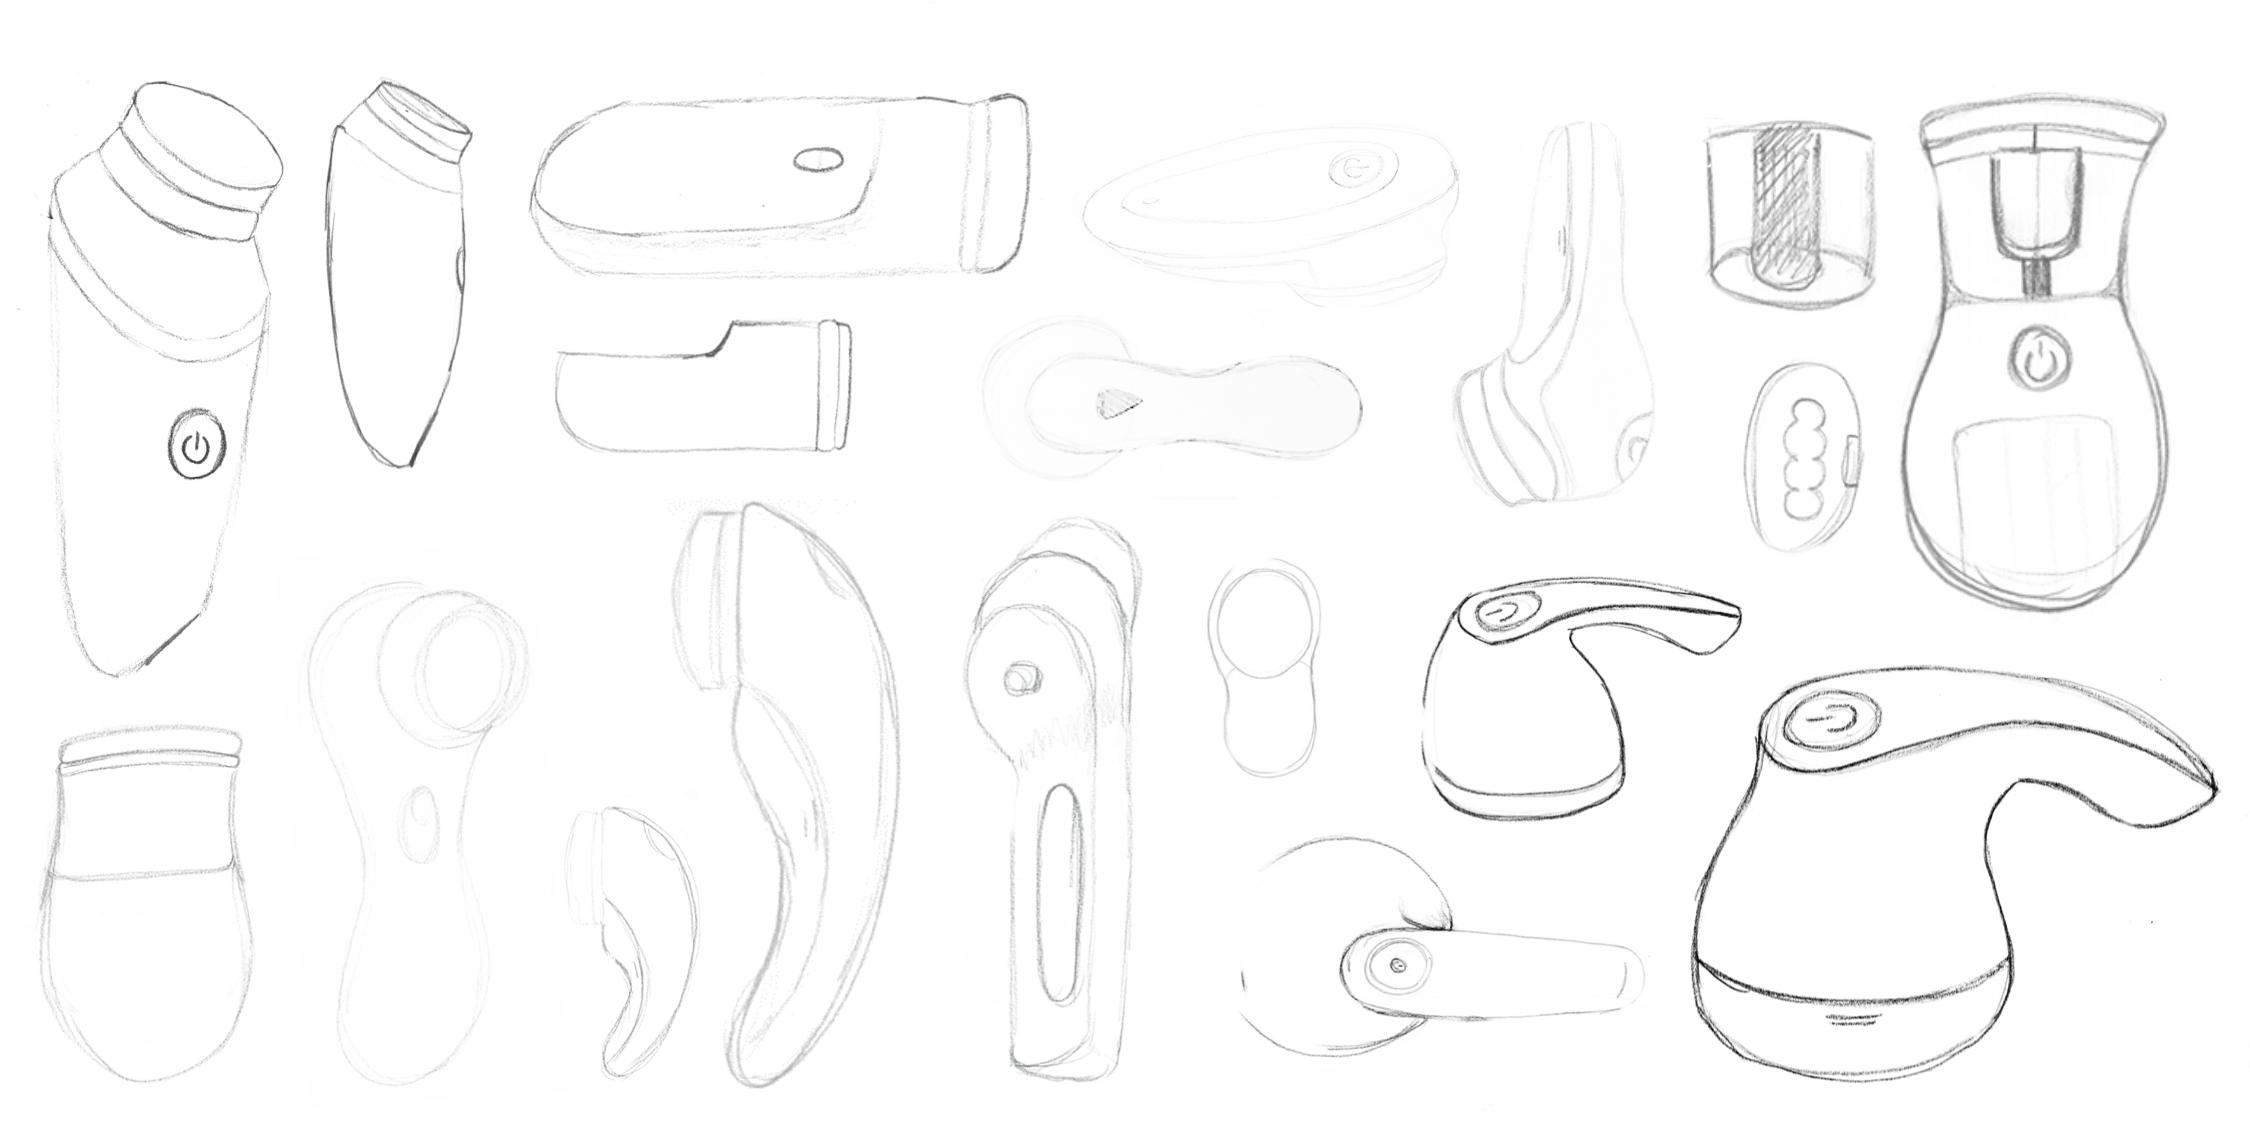 Preliminary sketches of potential designs.